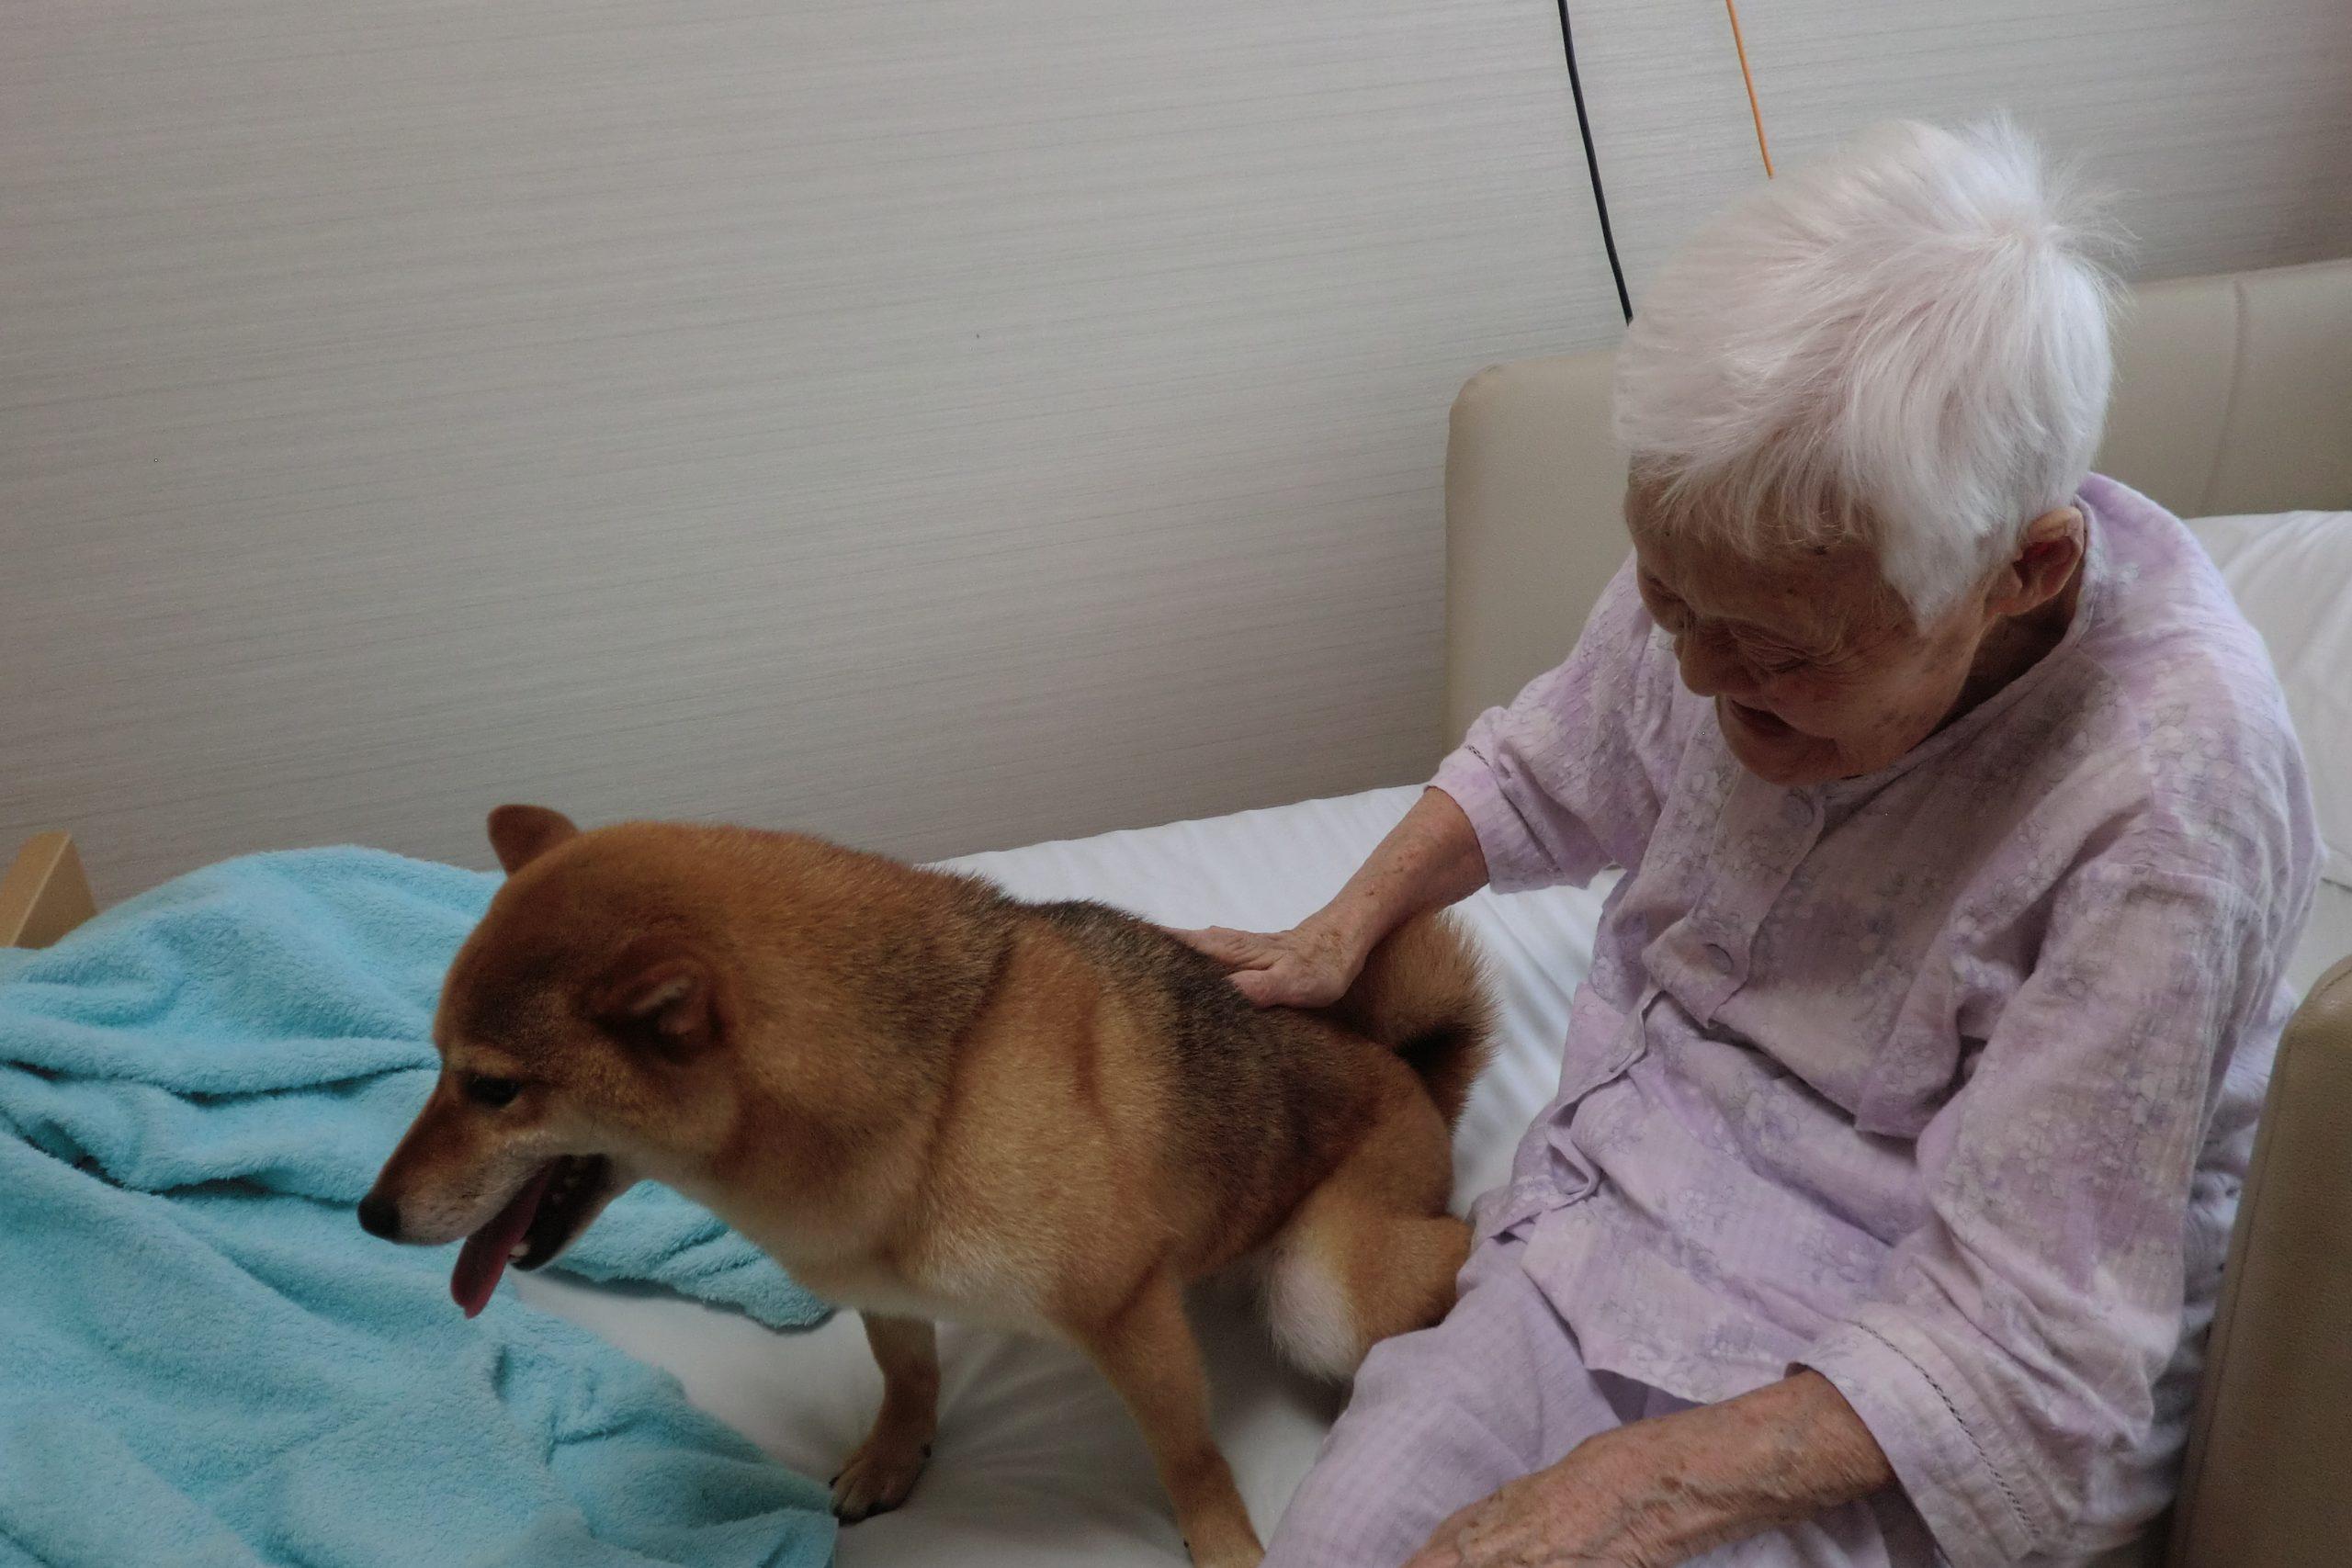 Dog therapies